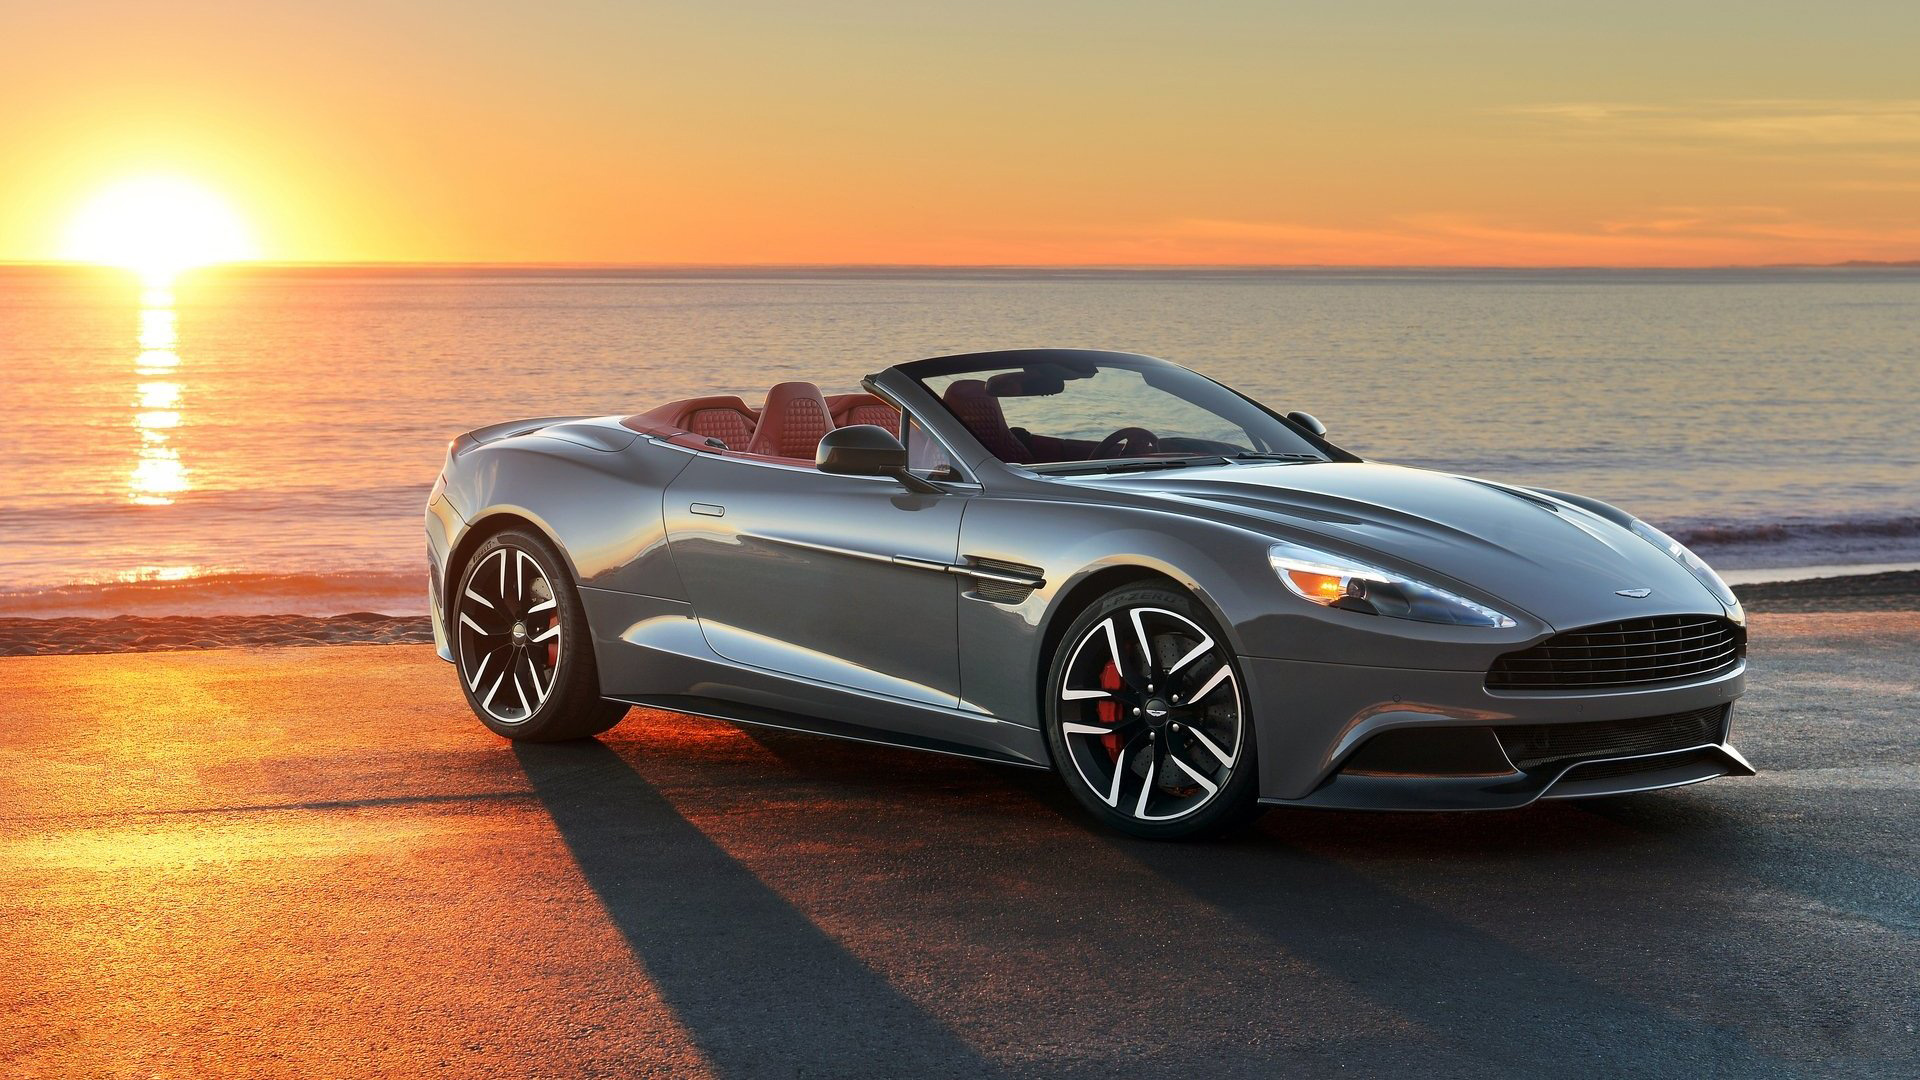 2015 Aston Martin Vanquish Volante Wallpaper 1920x1080